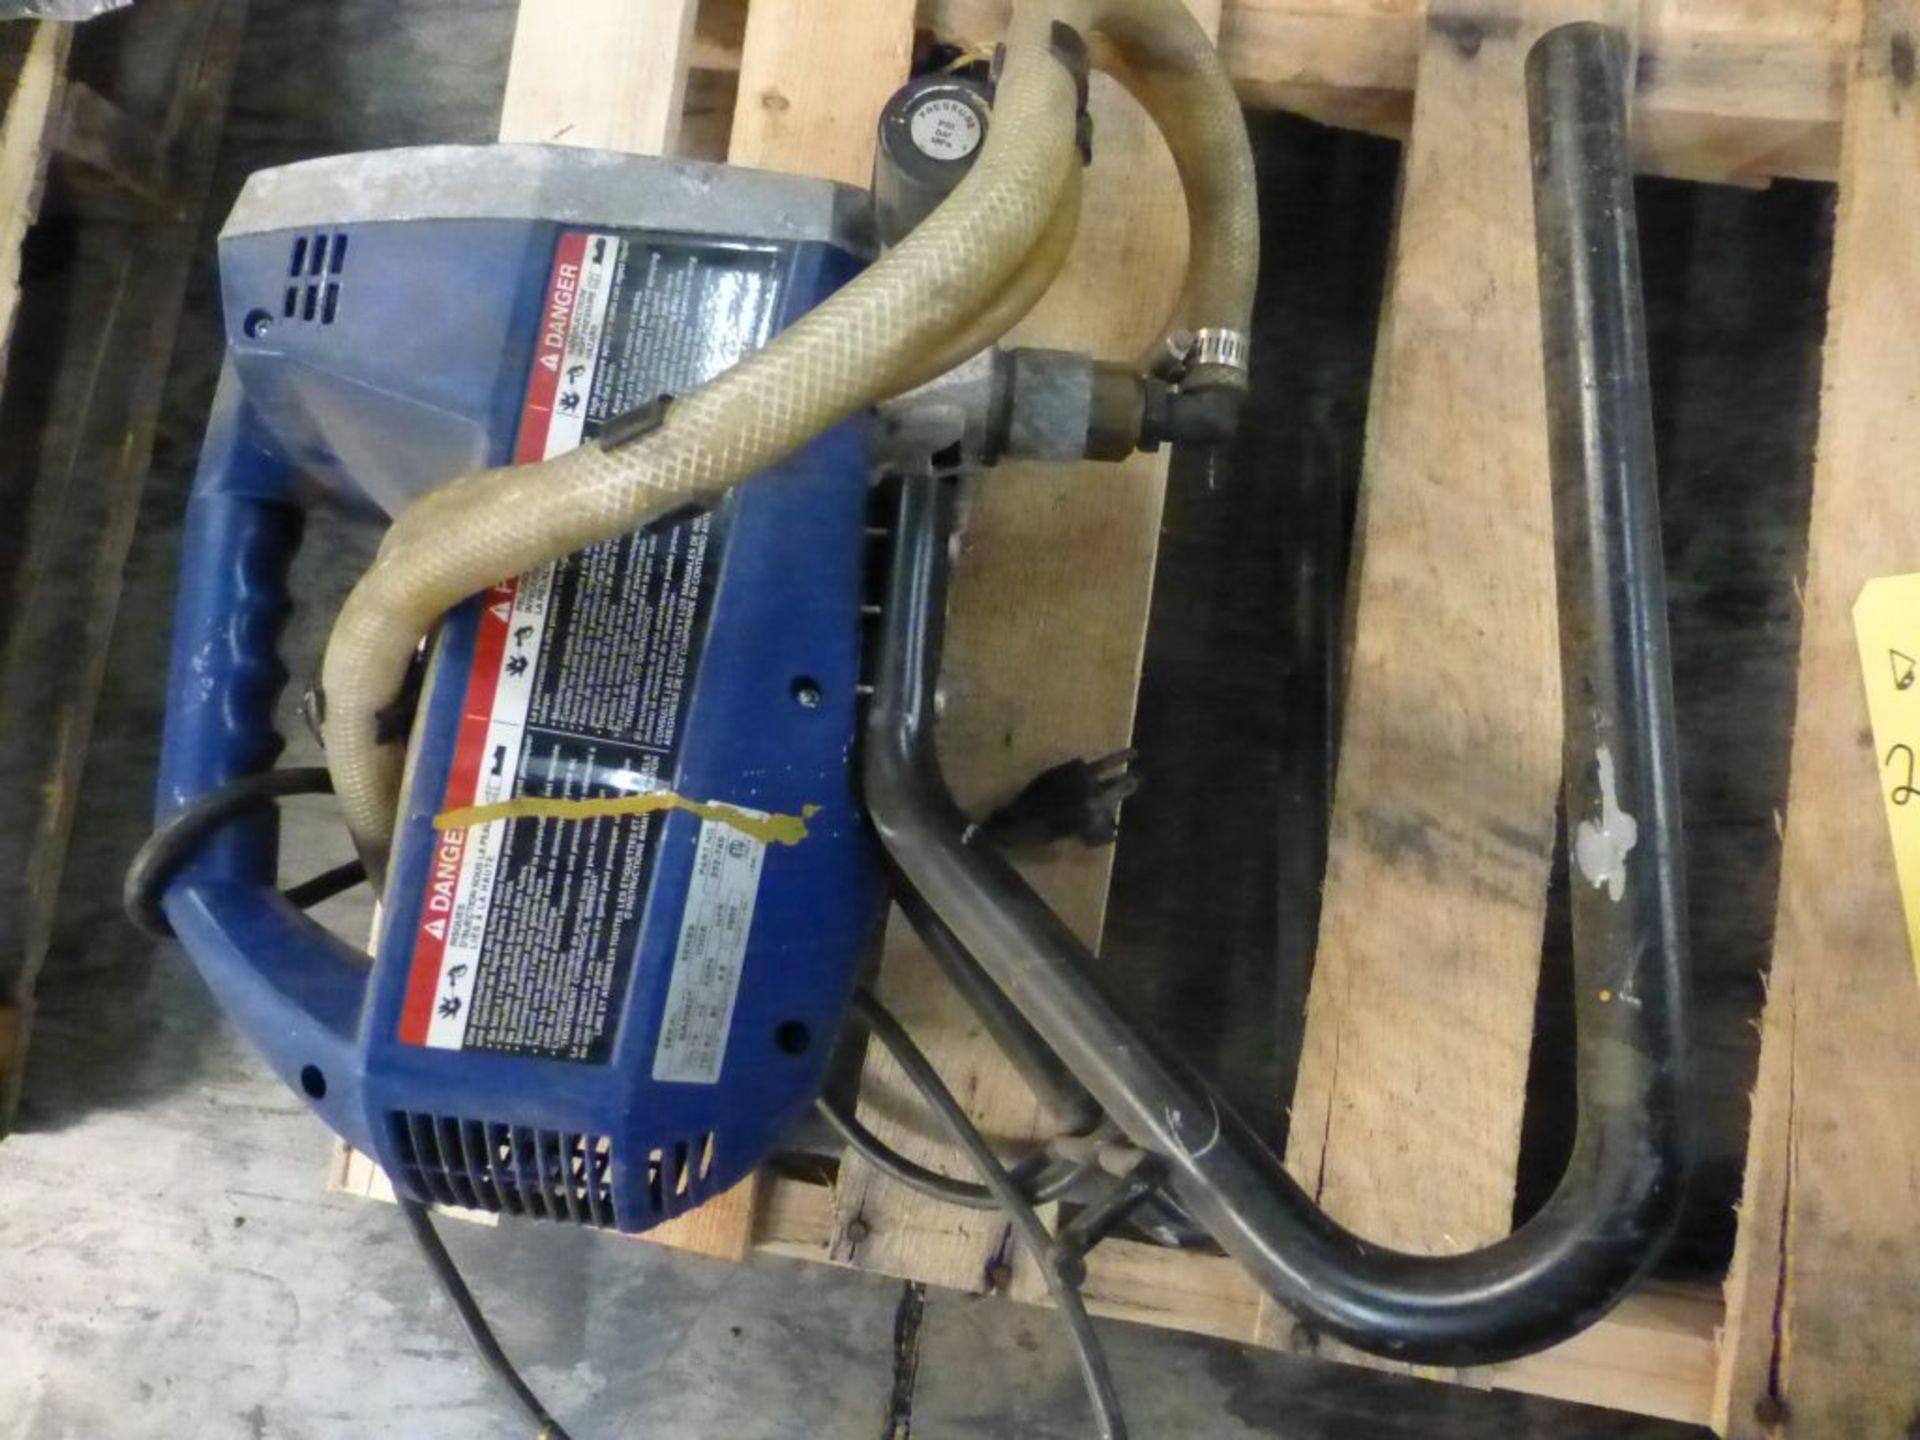 Graco Magnum XR5 Power Piston | Model No. XR-5; Part No. 232-740; 4.9A; 120V; 60 Hz - Image 5 of 6